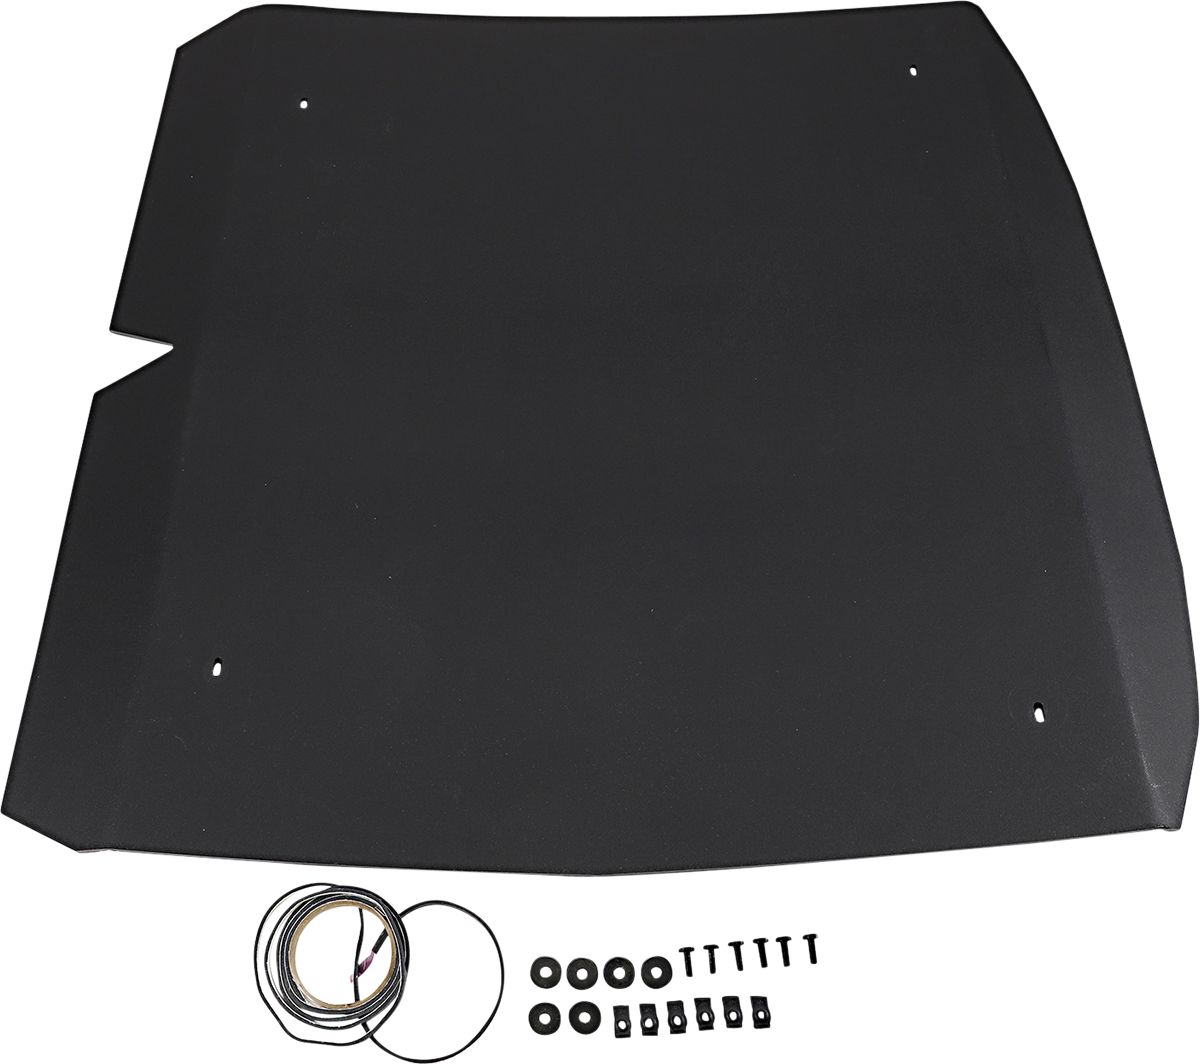 Moose Utility One Piece UTV Side by Side Roof Kit 2014-2021 Polaris RZR 900 1000